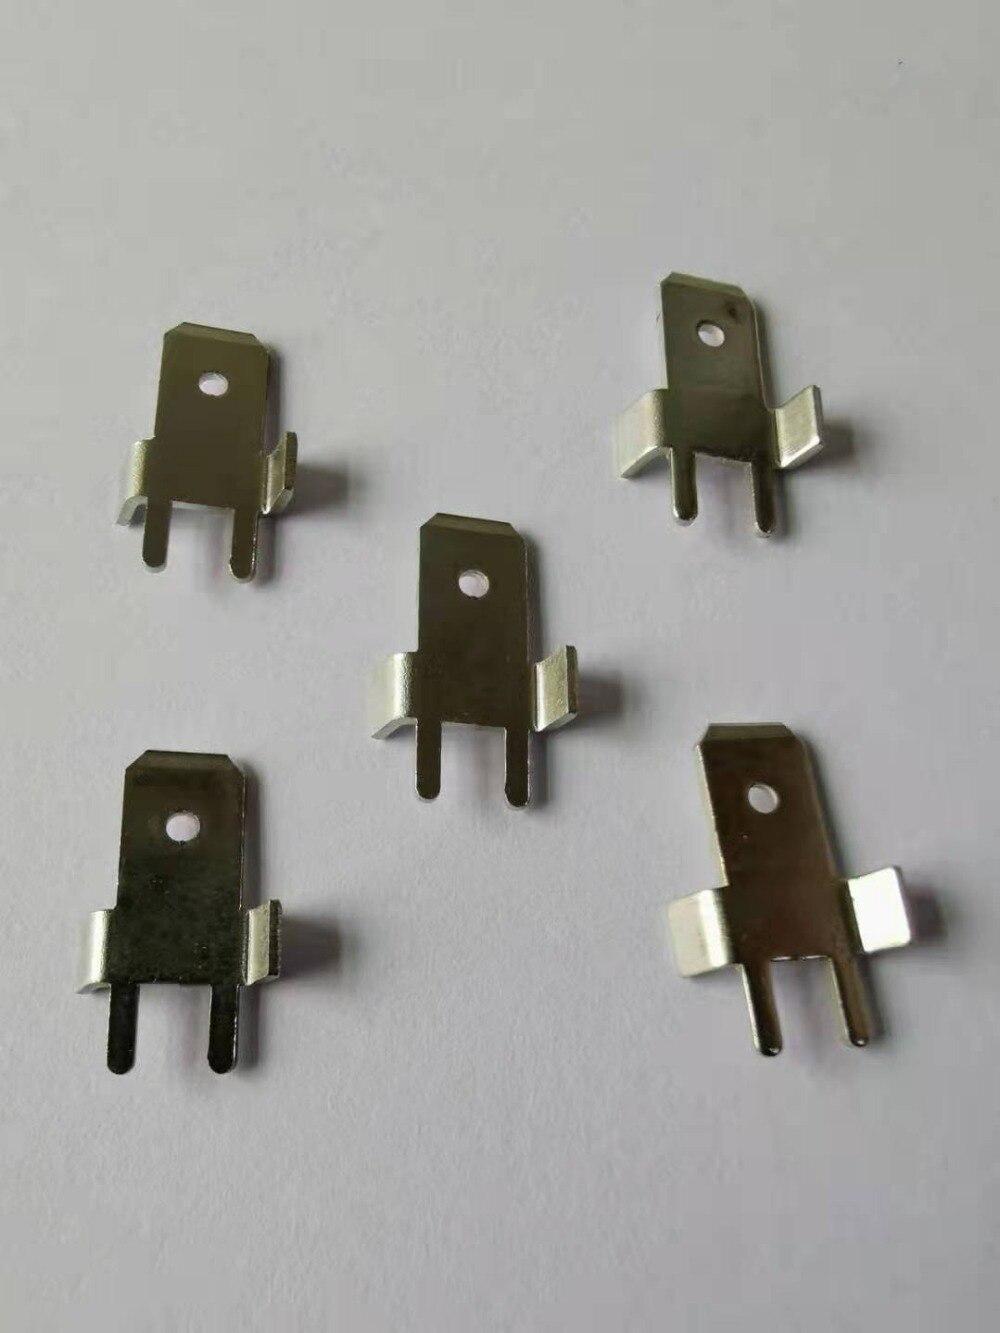 50 piezas 6,3 doble curvado inserto pcb terminal de soldadura insertar cobre estañado enchufe macho UMIDIGI F1 jugar Android 9,0 48MP + 8MP + 16MP cámaras 5150mAh 6GB RAM 64GB ROM 6,3